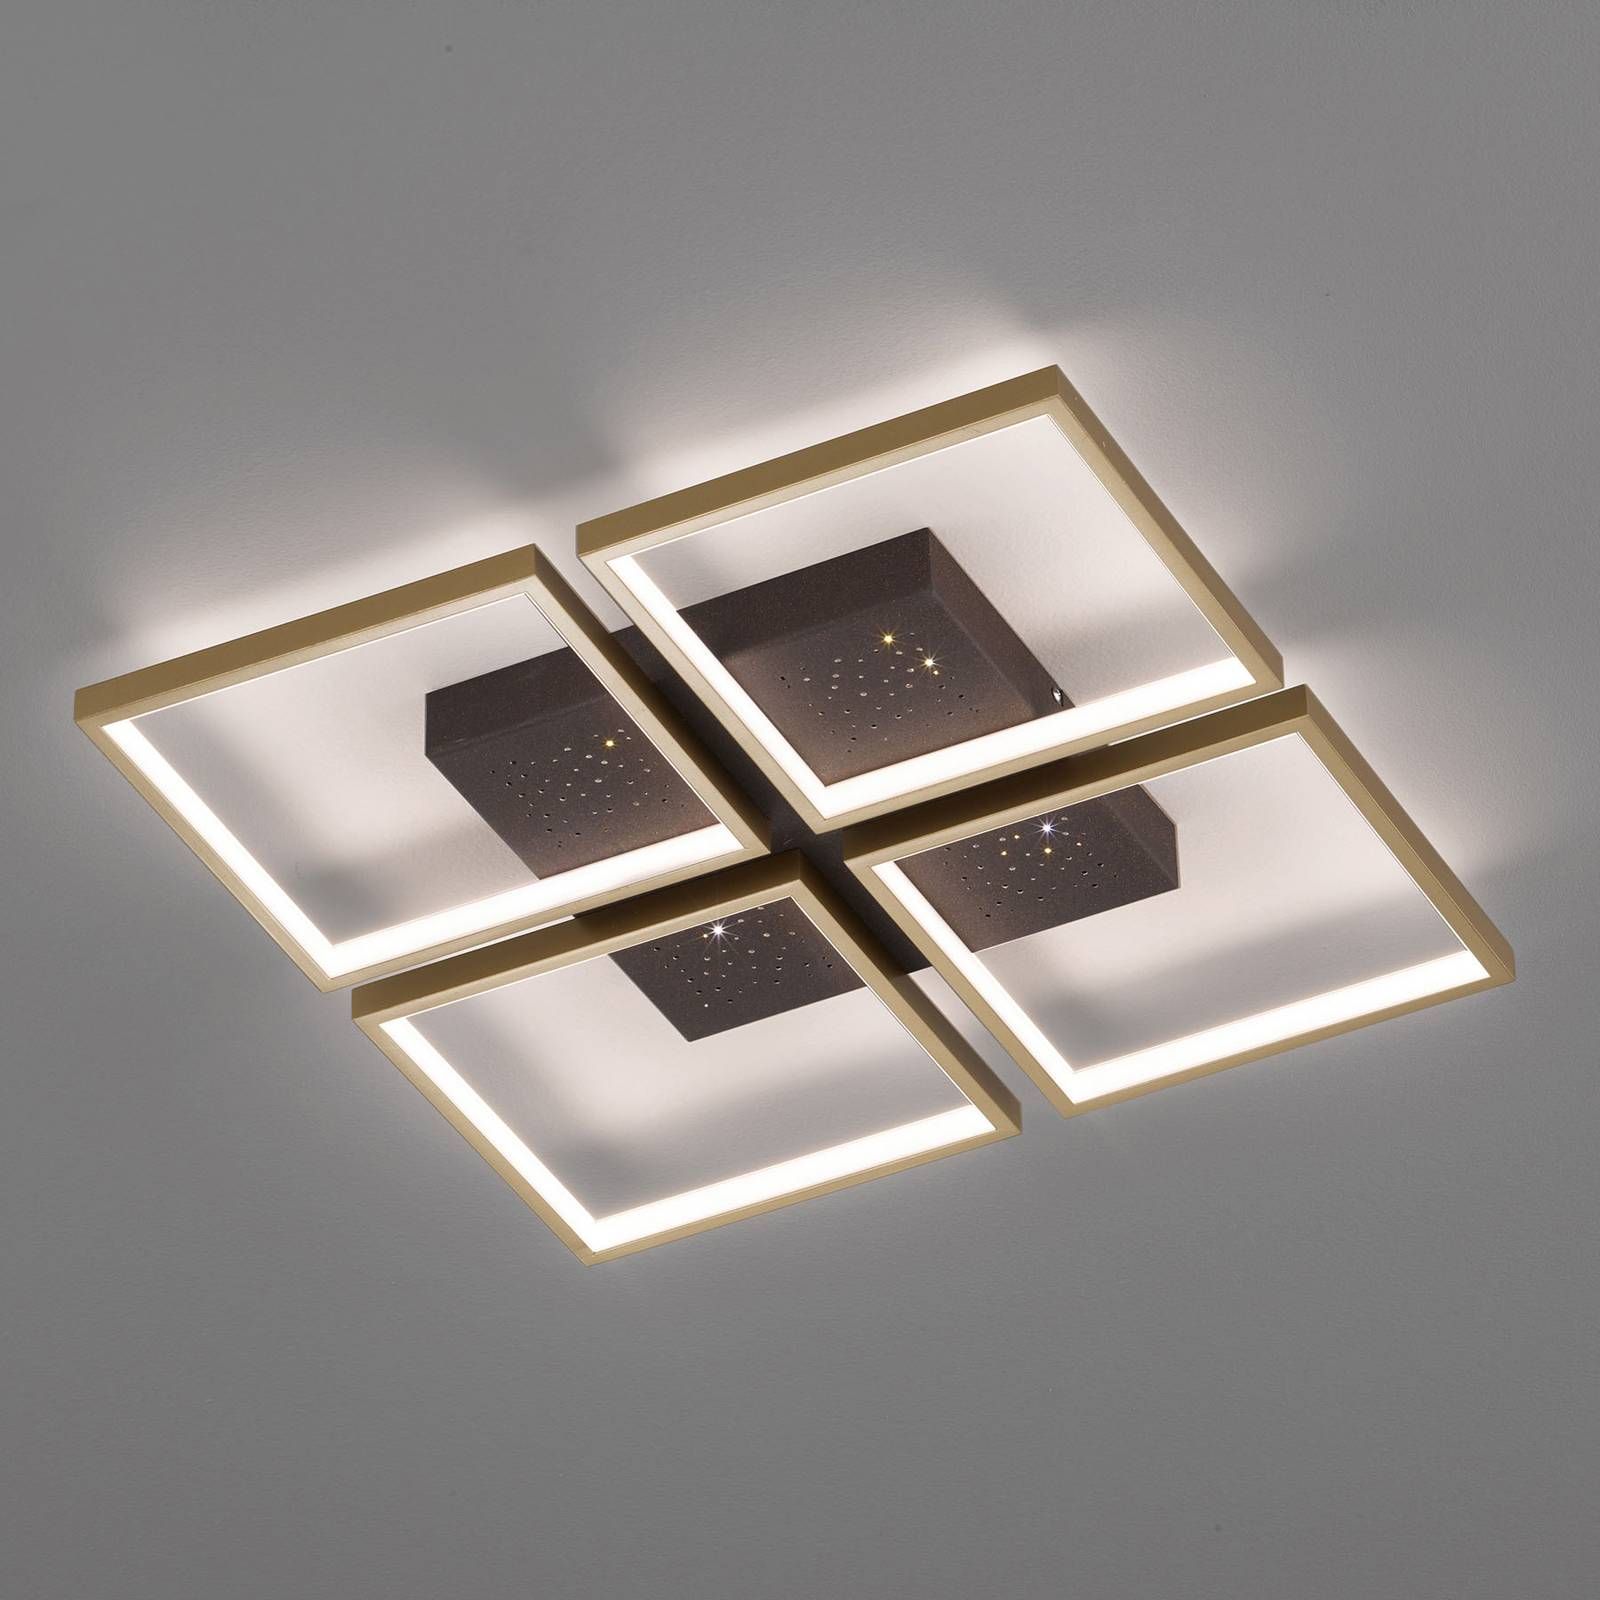 LED-kattovalaisin Pix, 4-lamppuinen, 54 x 54 cm